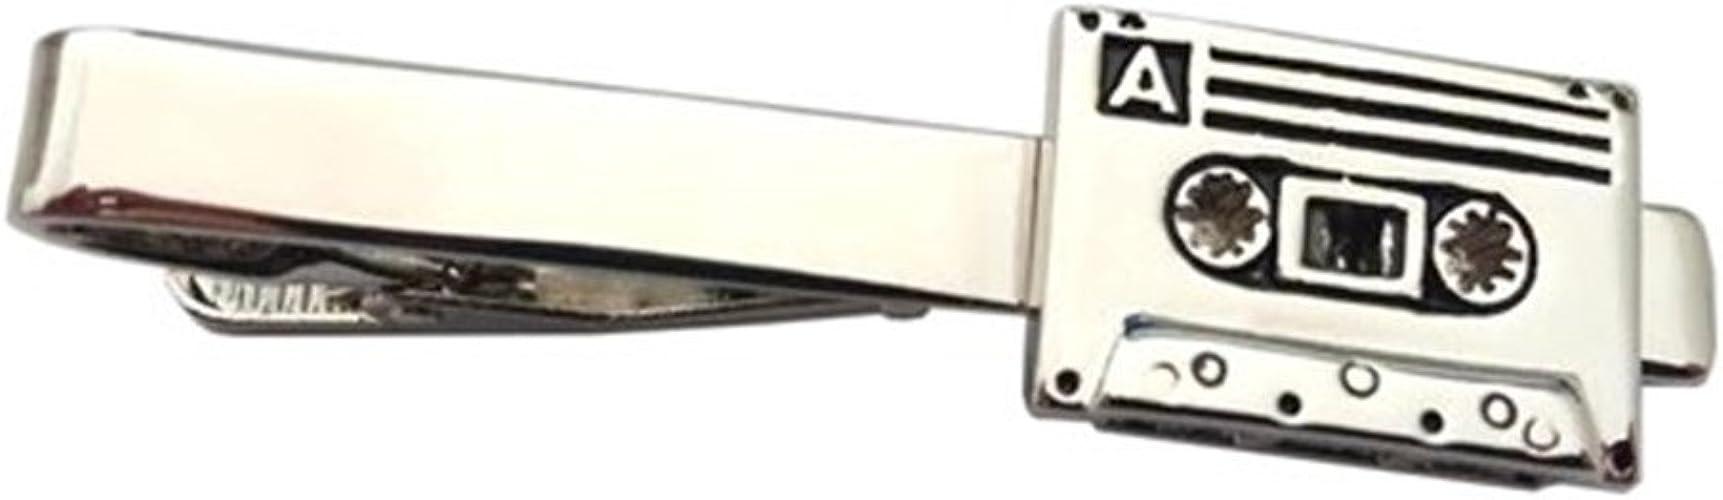 Caja de reproductor de casete Dj música músico Clip de corbata ...